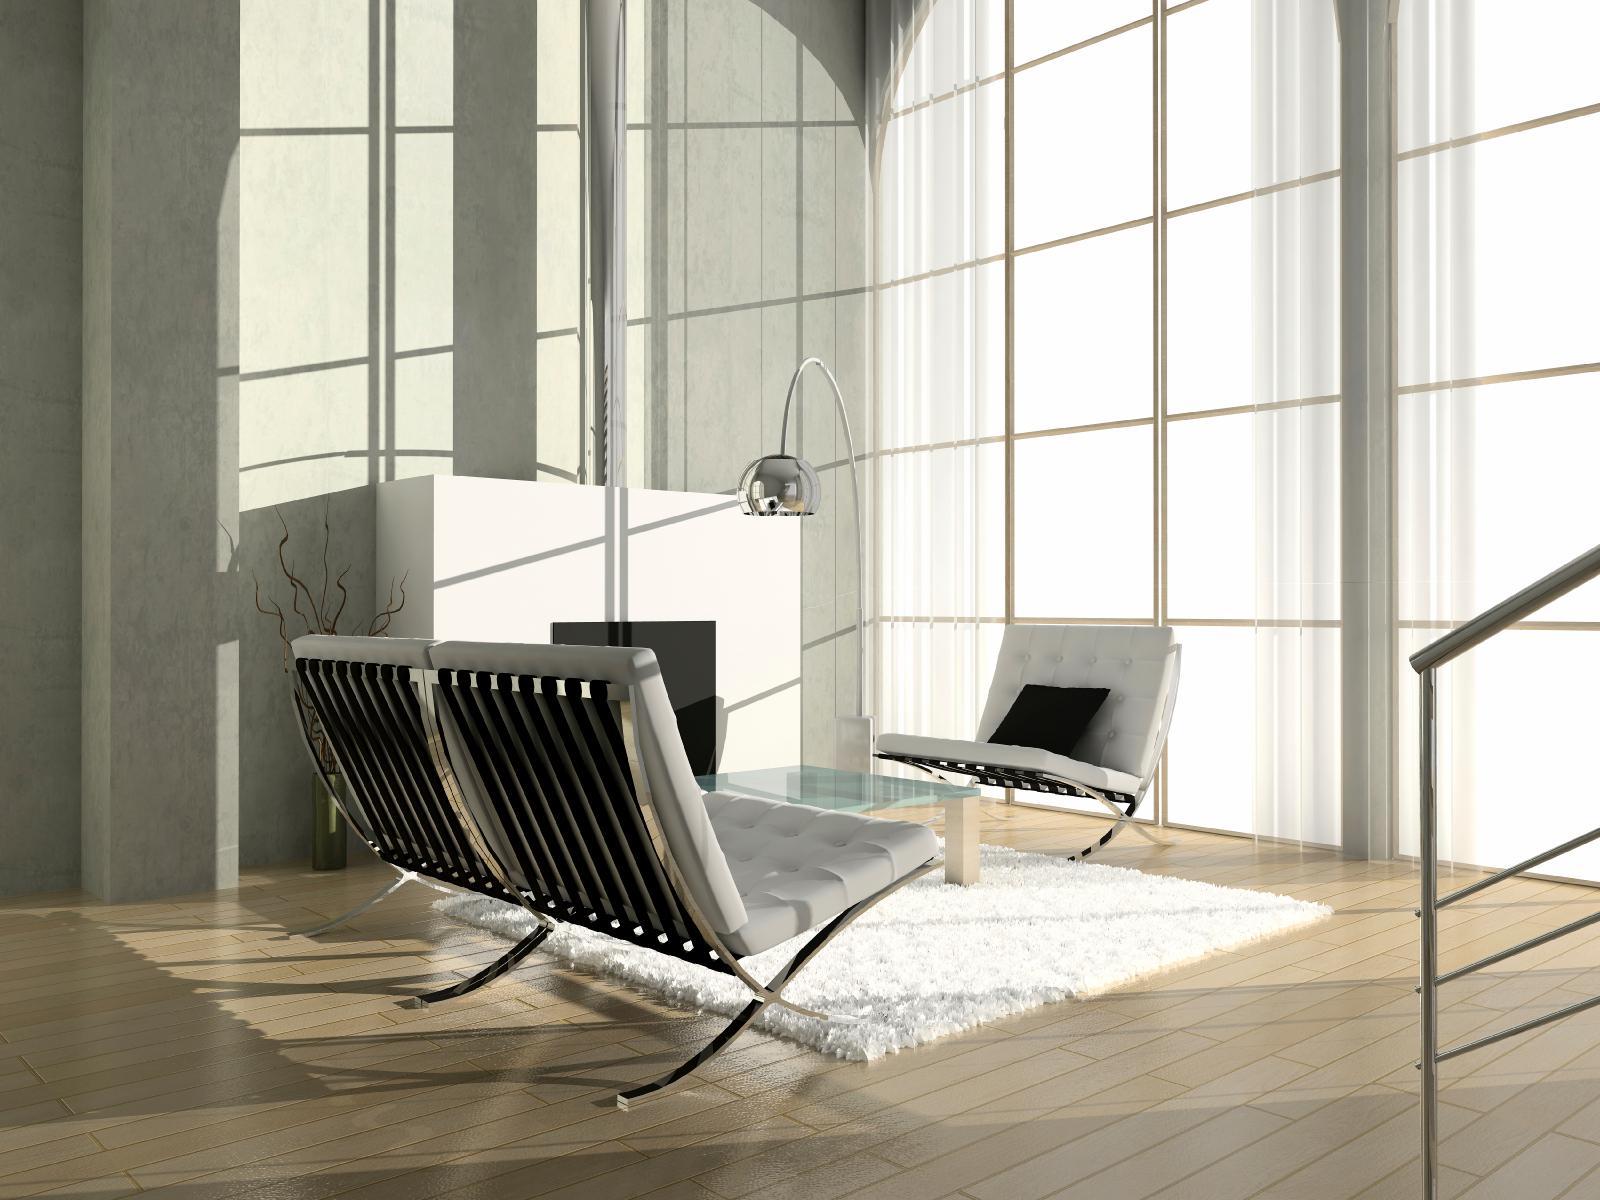 bewerten gutachten verkaufen immobilien einwerten immobilienvermietung immobilie bewerten. Black Bedroom Furniture Sets. Home Design Ideas